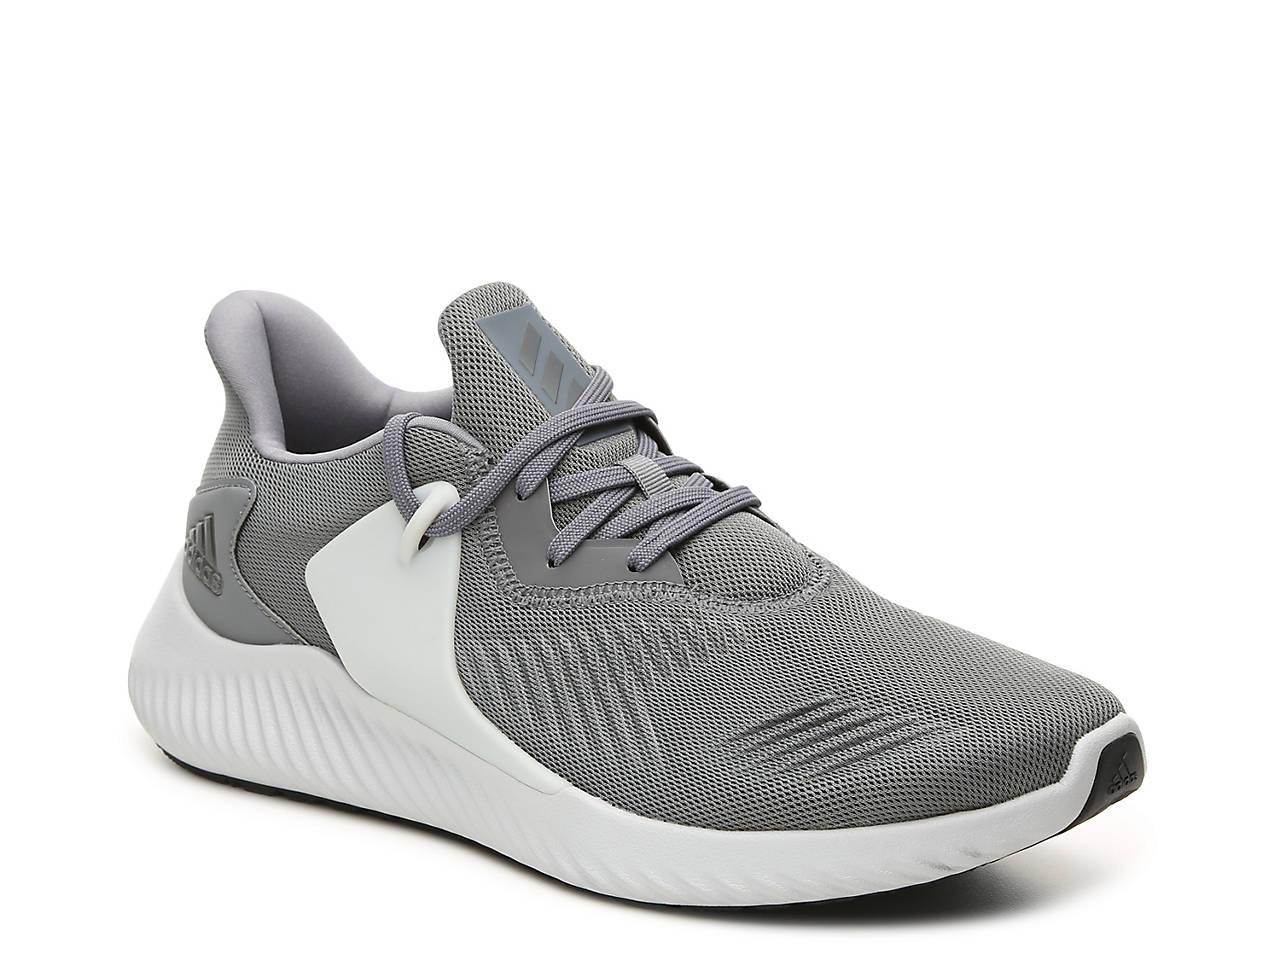 a5fd1a86cd34c adidas Alphabounce RC 2 Running Shoe - Men s Men s Shoes